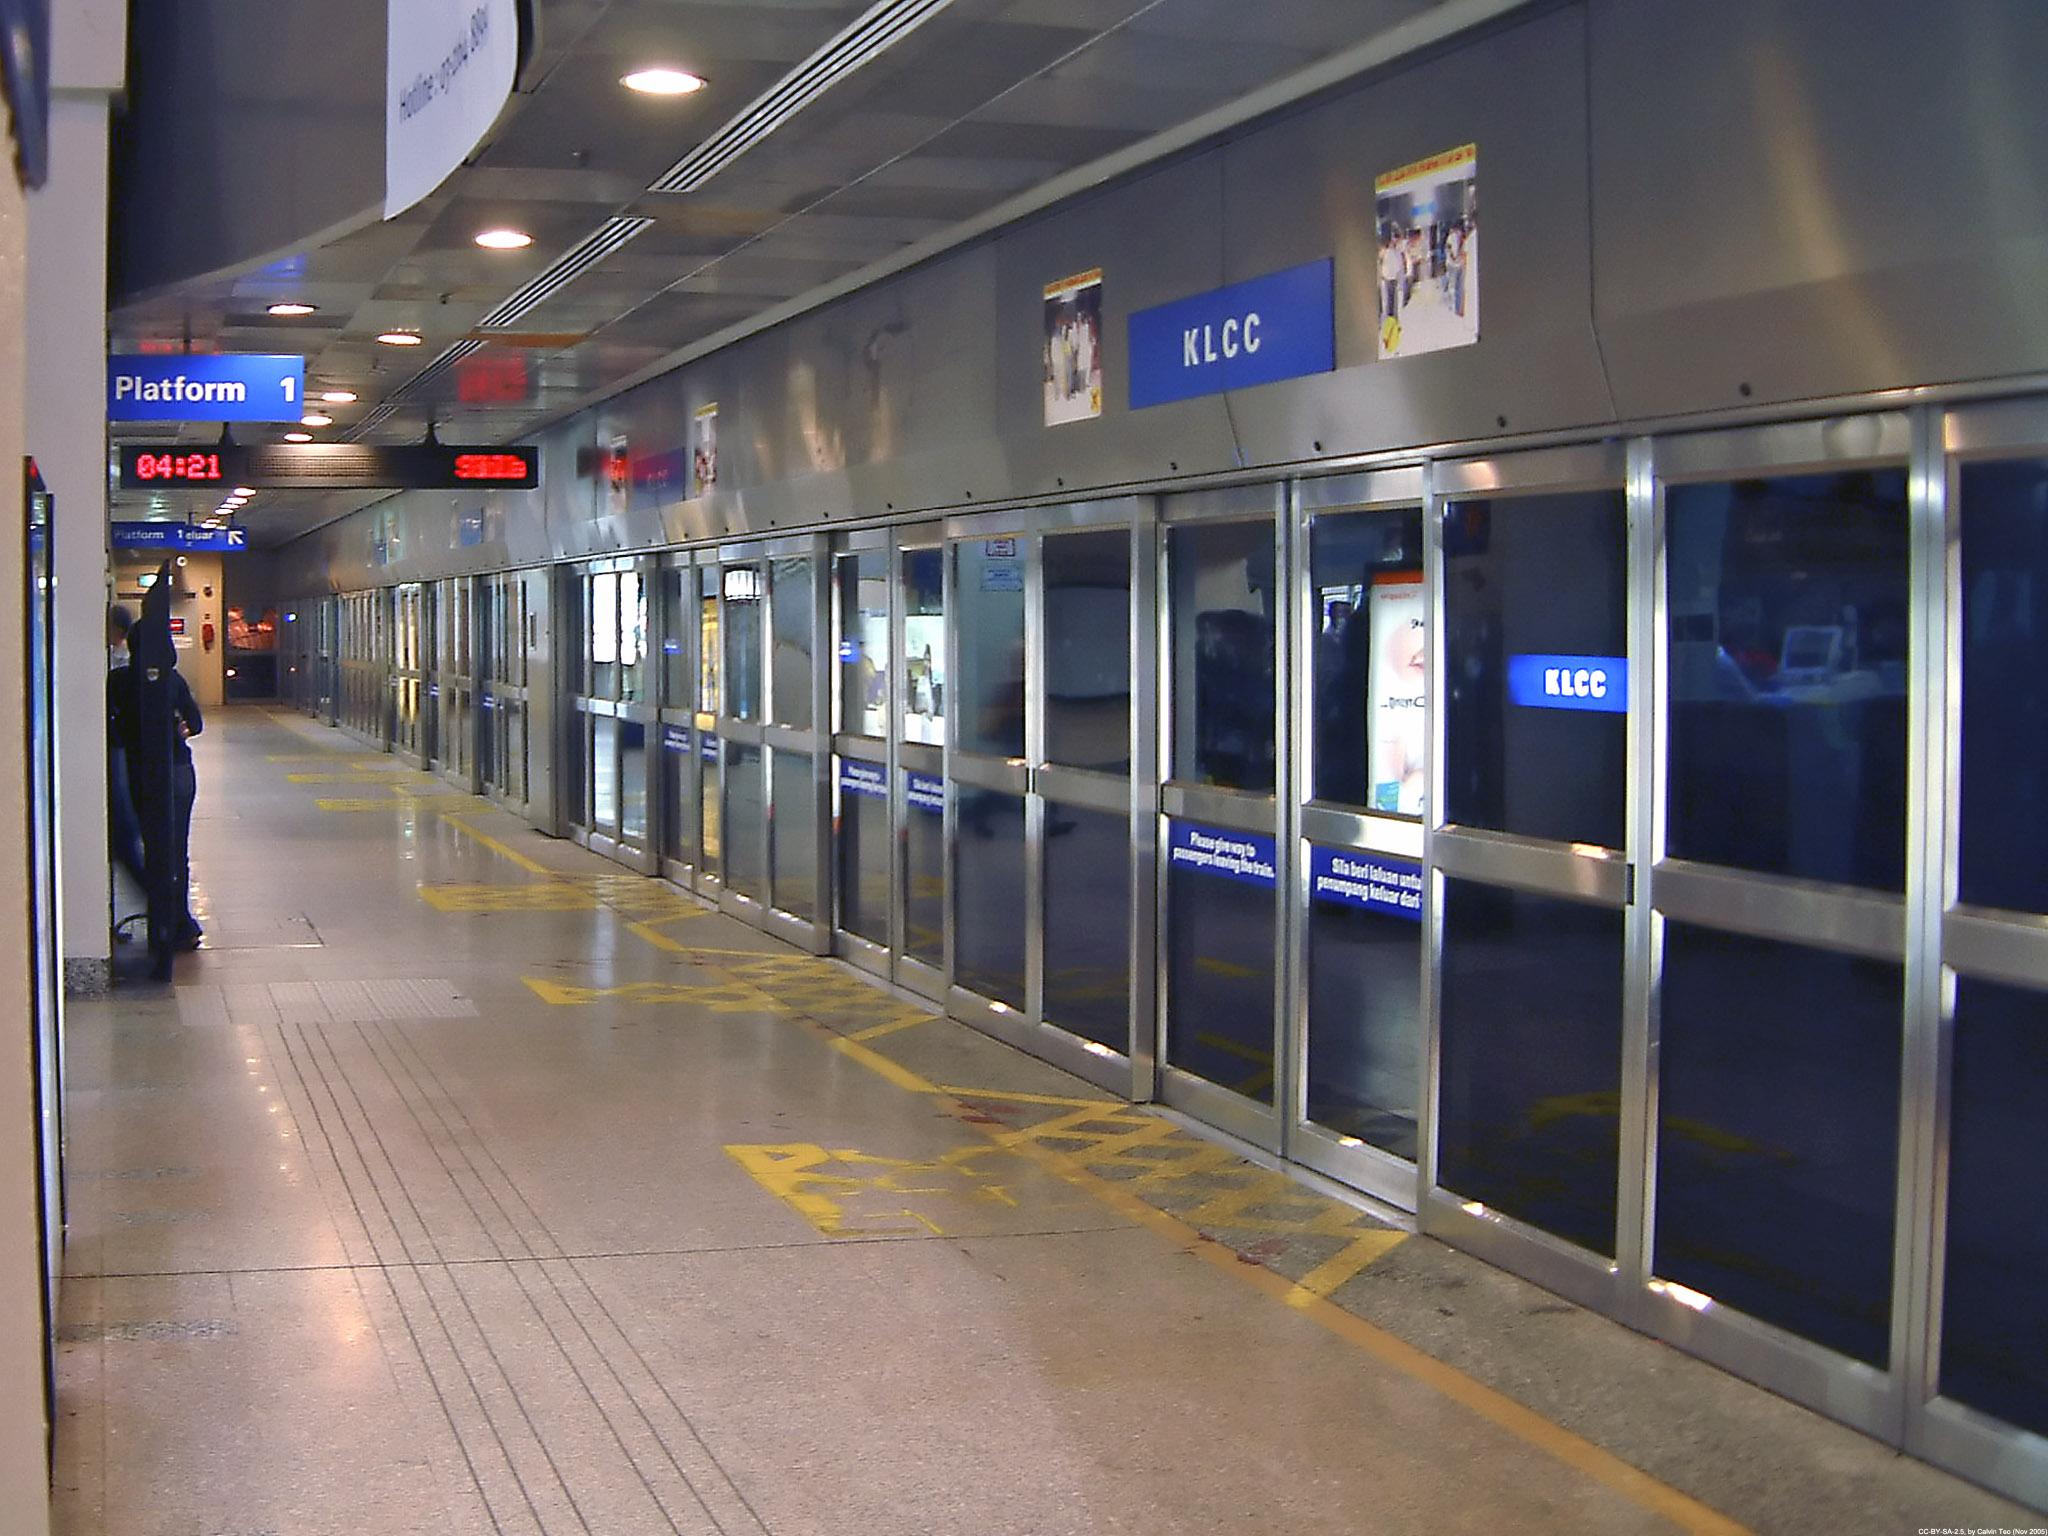 Platform of the KLCC LRT station along the Kelana Jaya Line (Putra LRT) in Kuala Lumpur